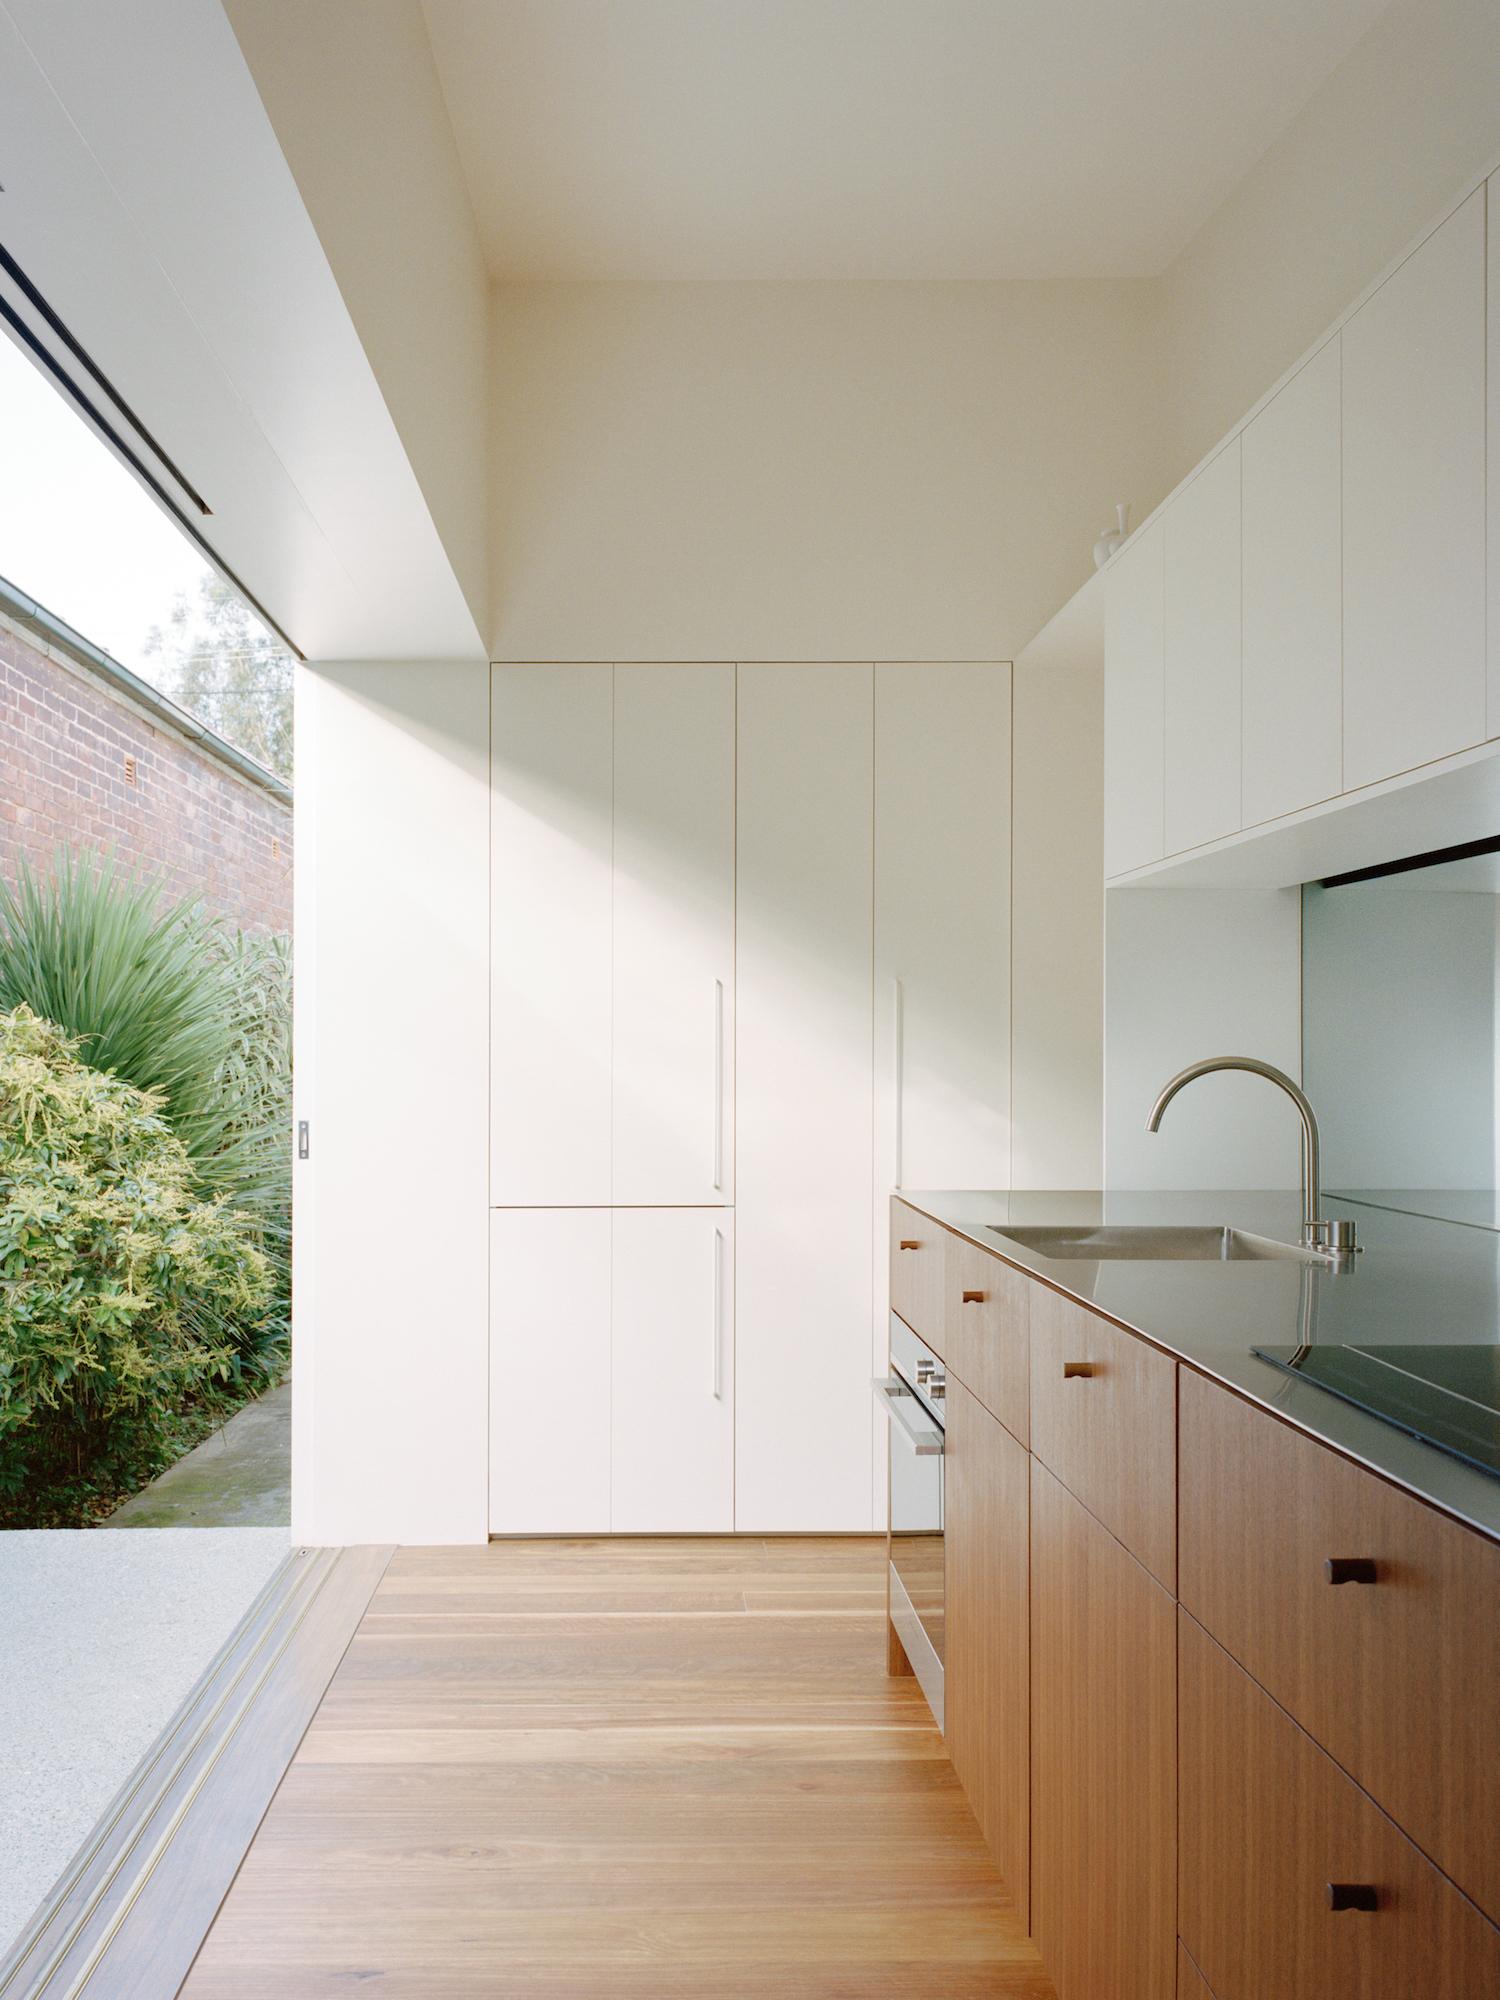 JJ House by Bokey Grant